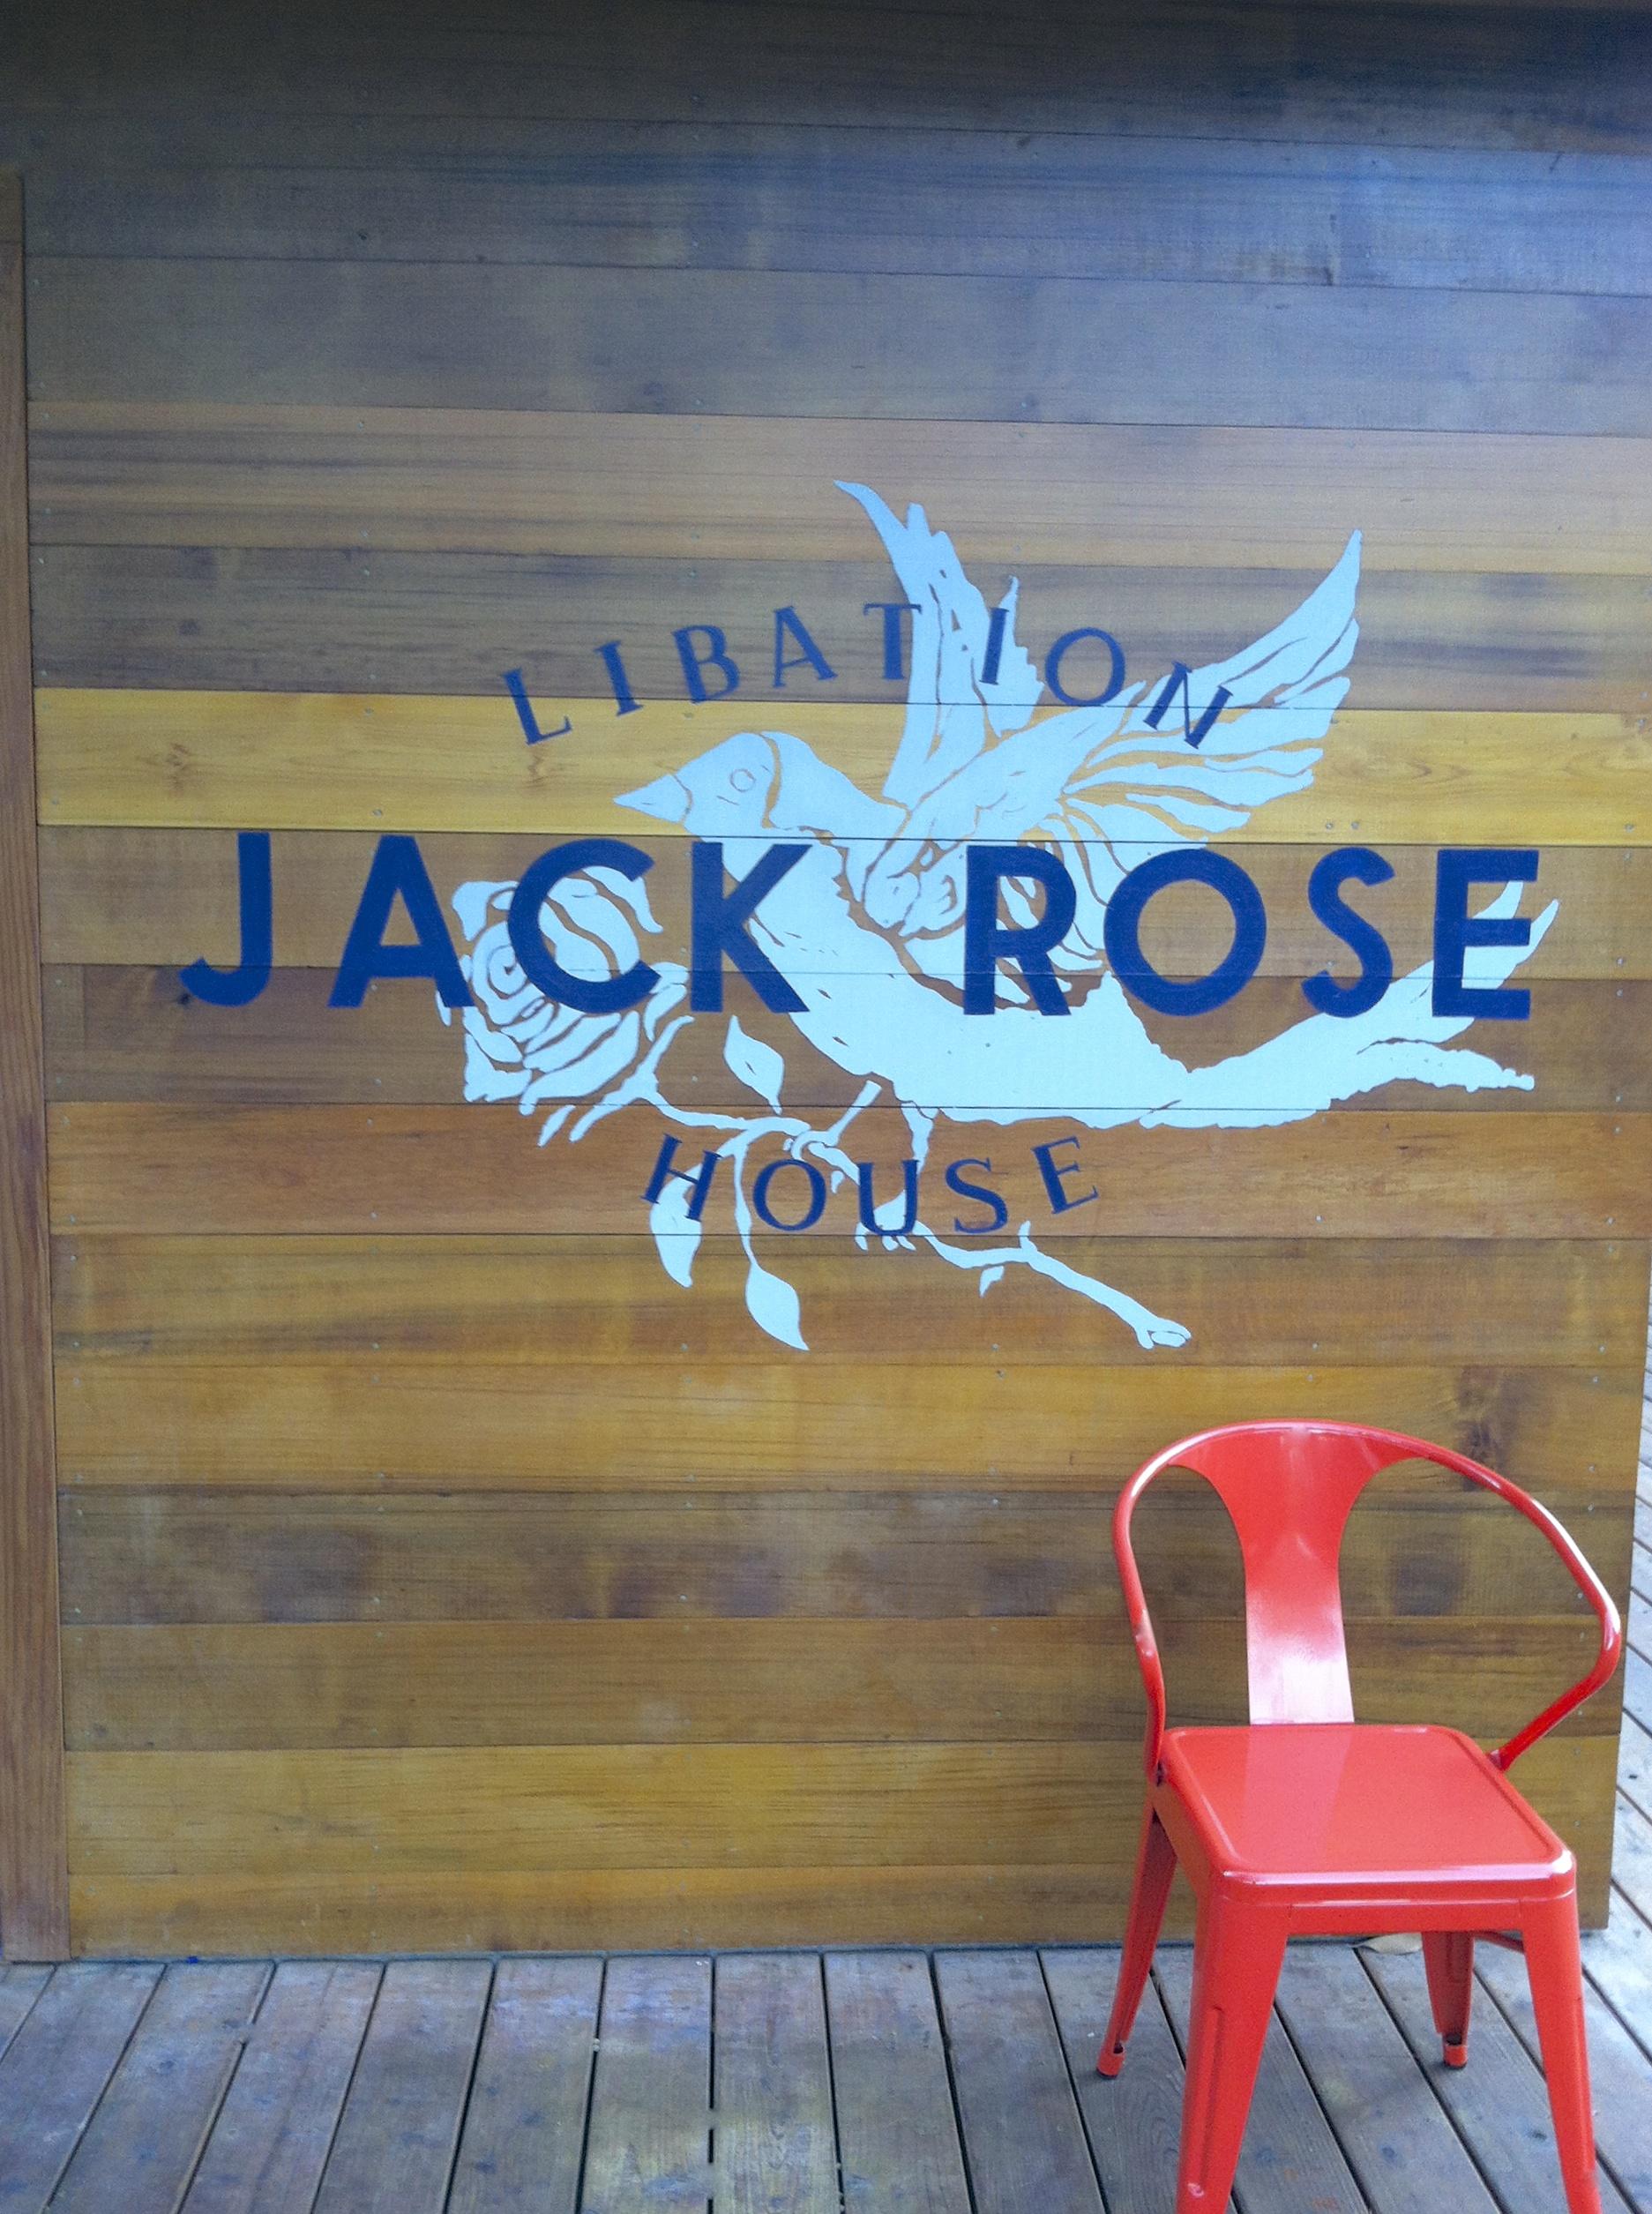 Jack Rose Libation House